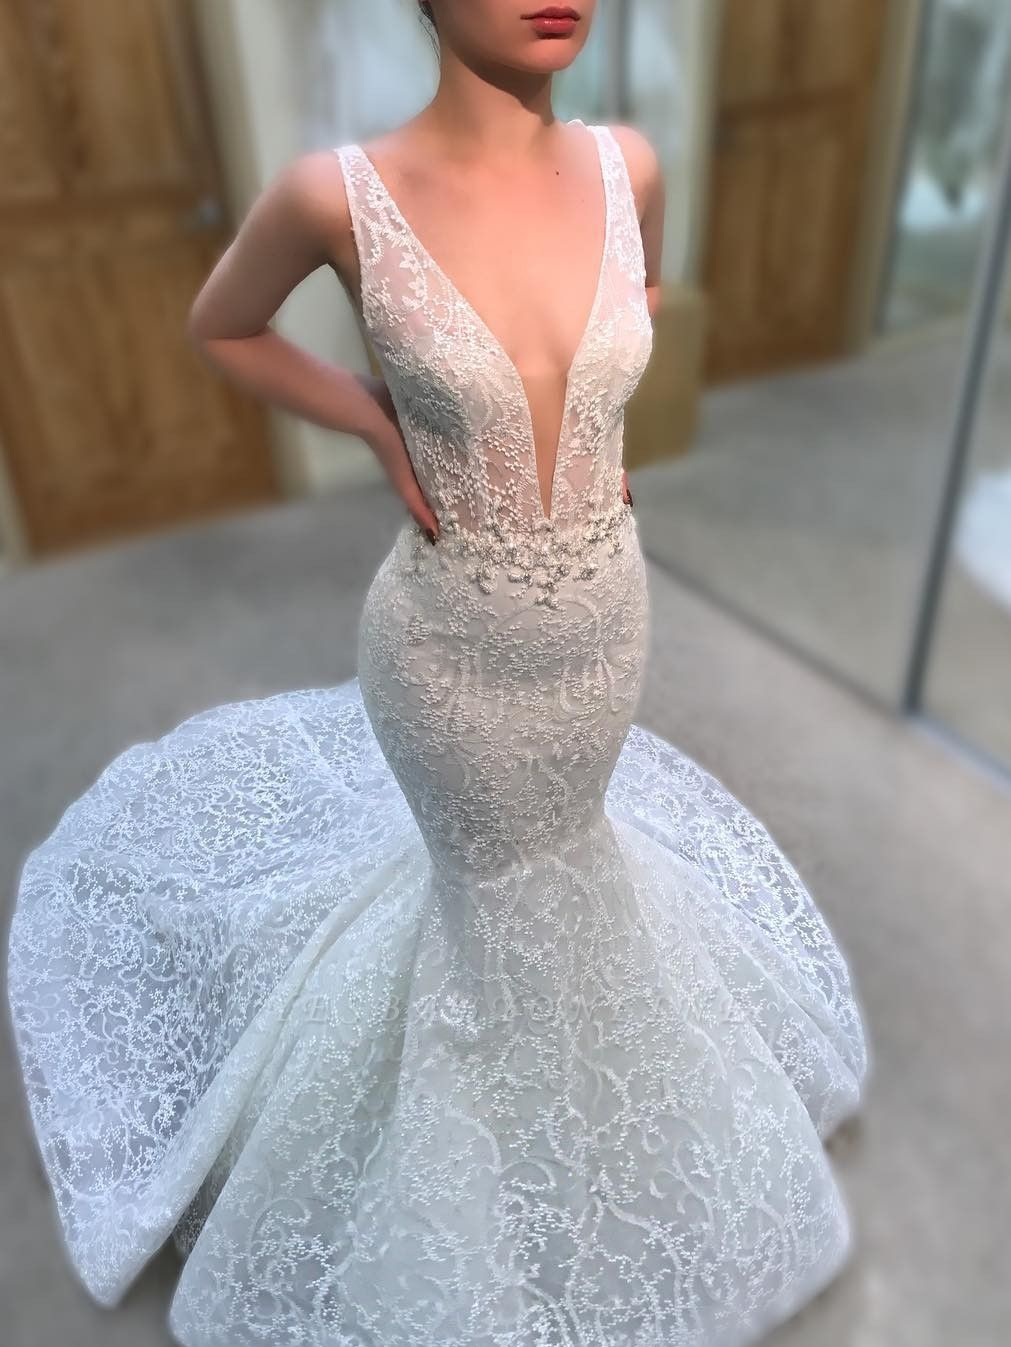 Charming Lace Mermaid Wedding Dresses   V-Neck Sleeveless Beaded Bridal Gowns